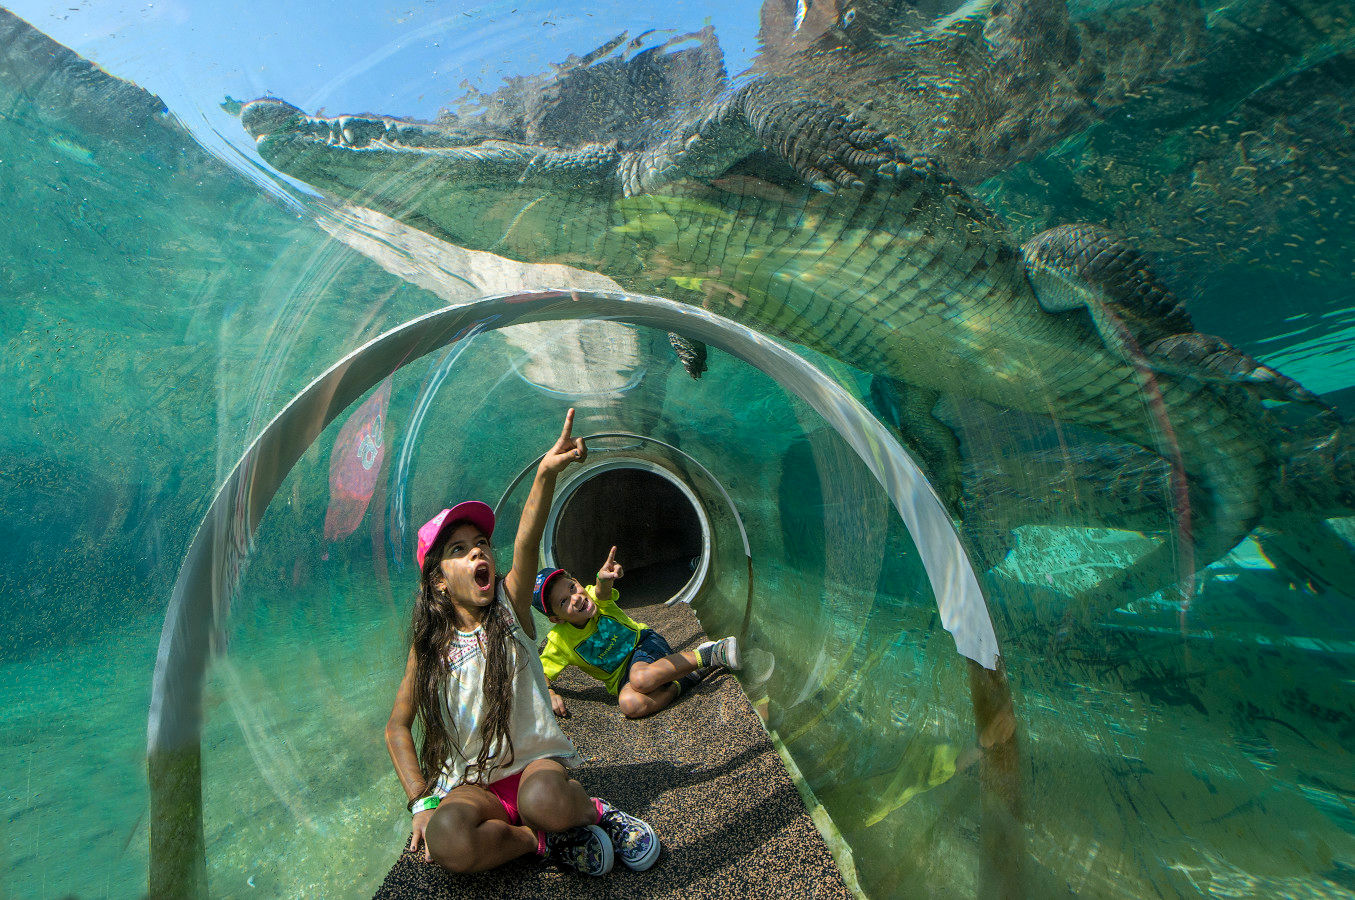 Croc tunnel